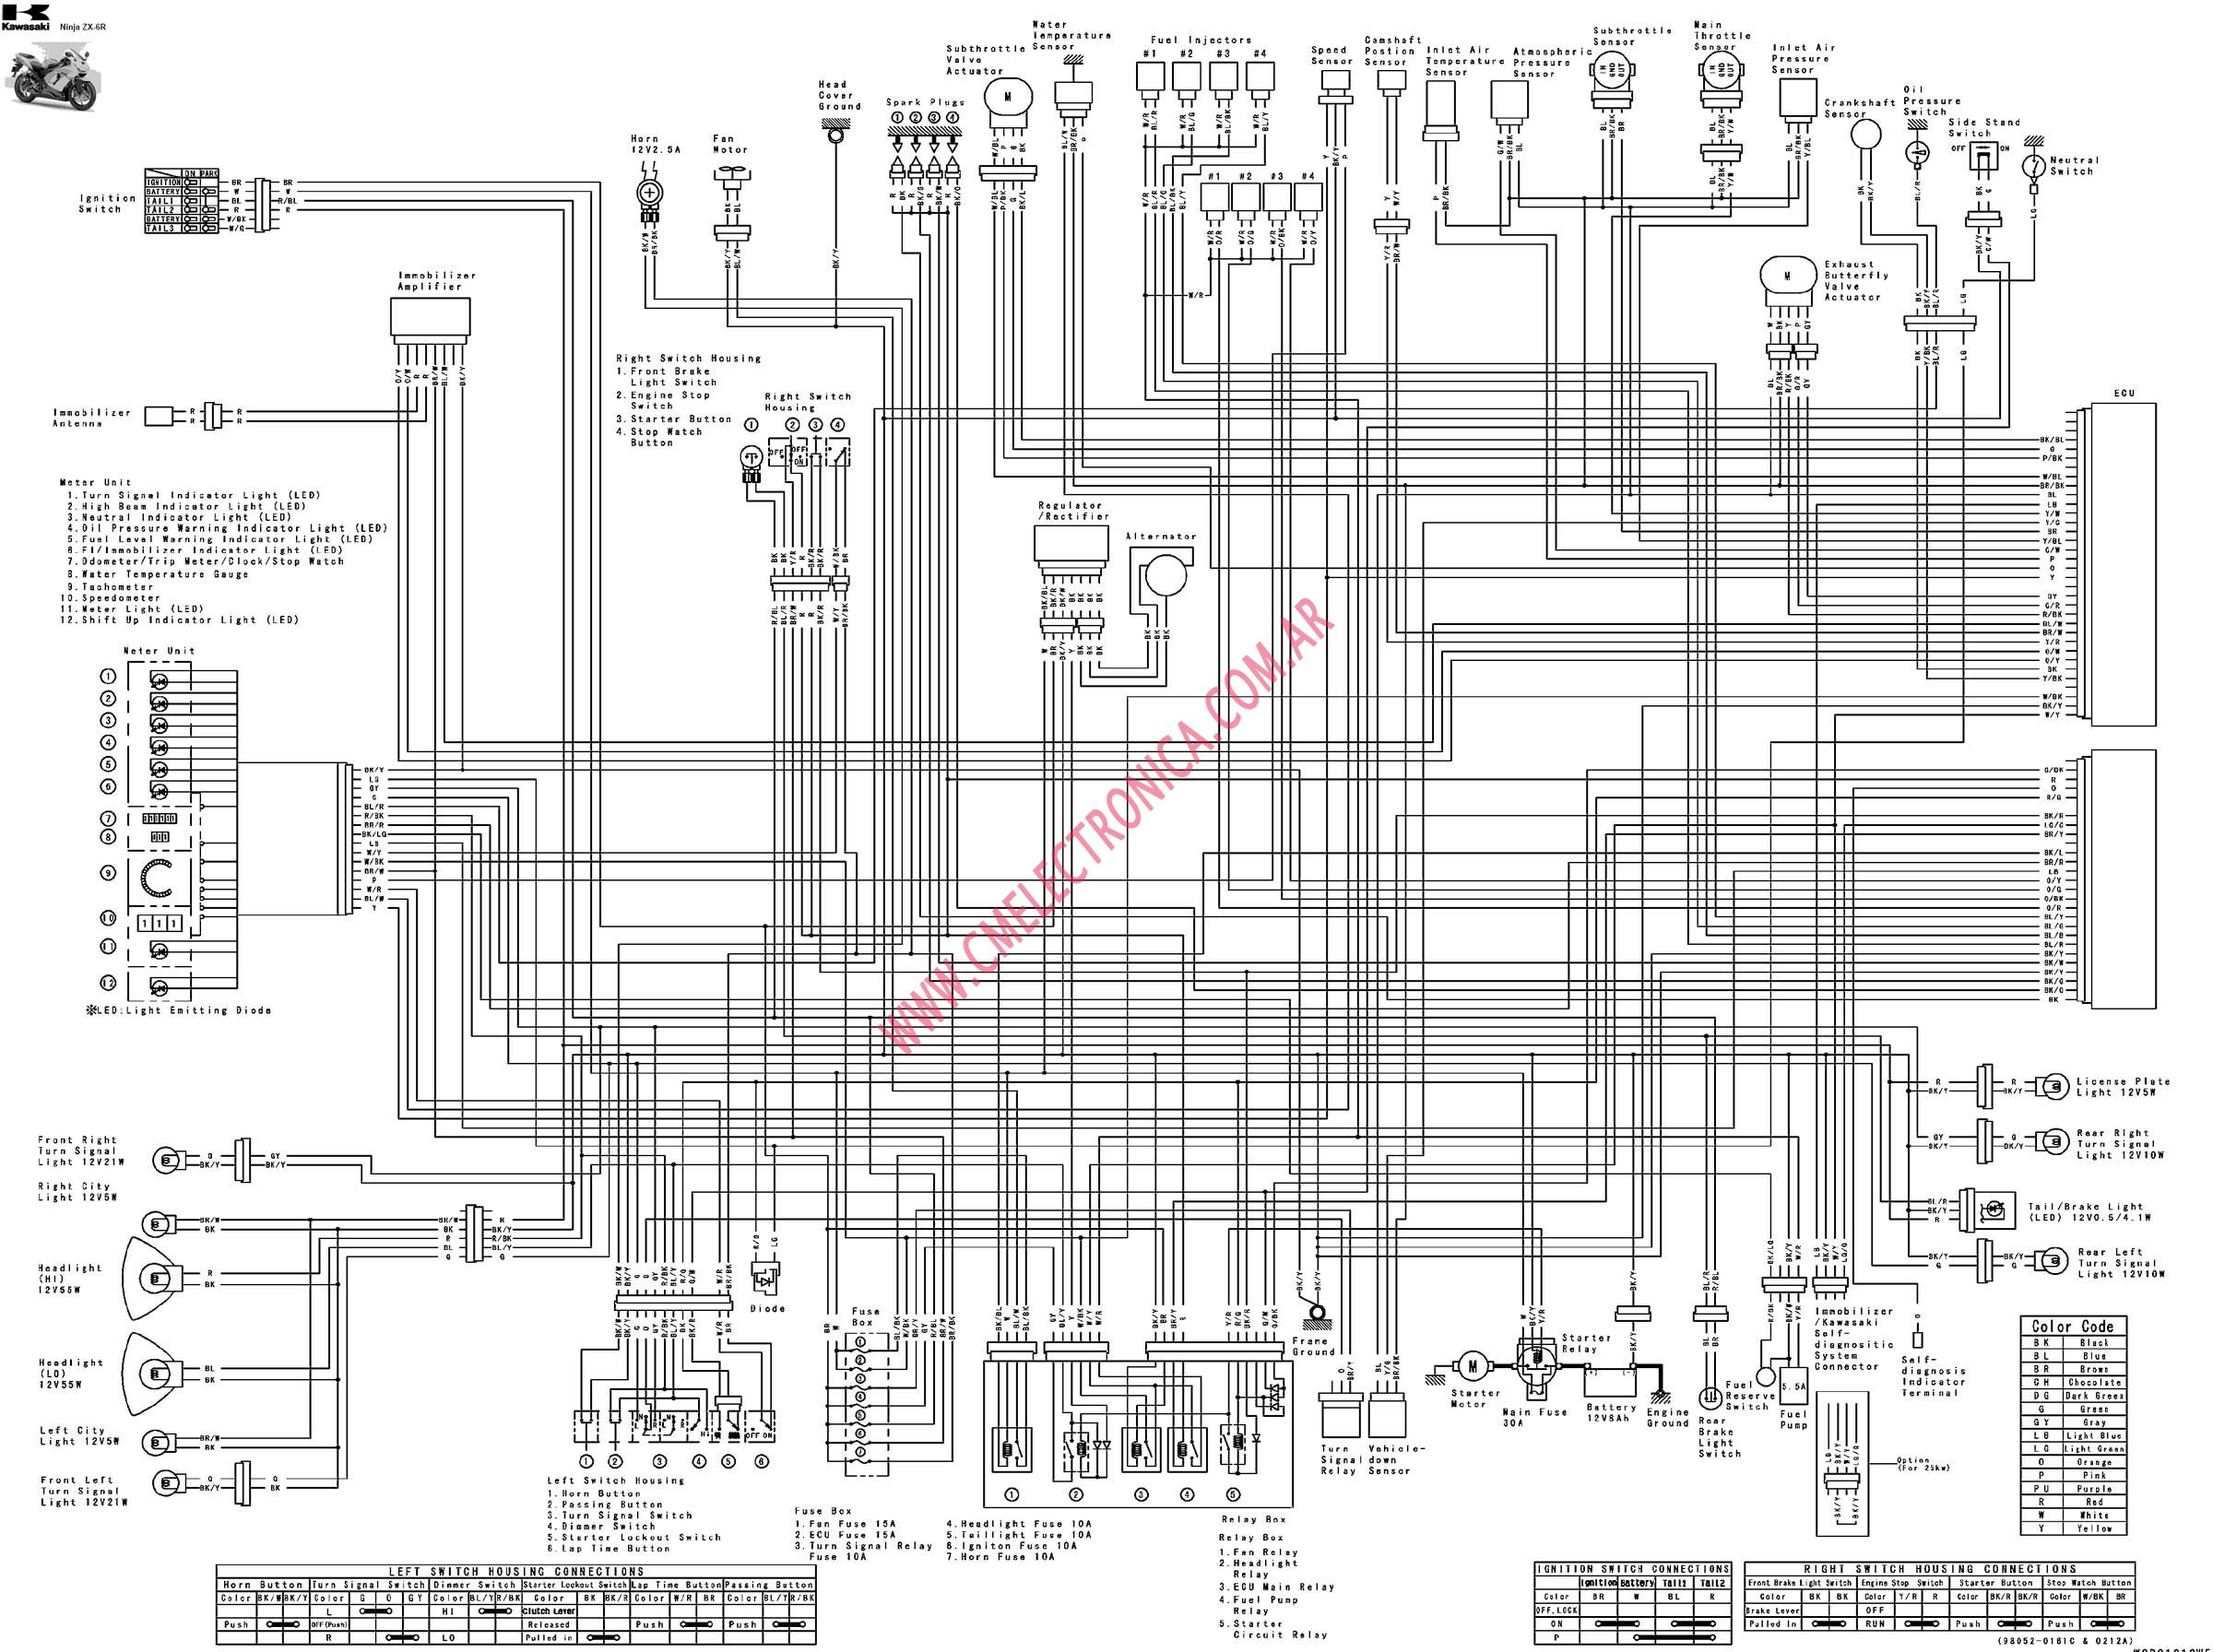 2003 kawasaki zx6r diagram 9 2 gvapor nl kawasaki zx 6r 05